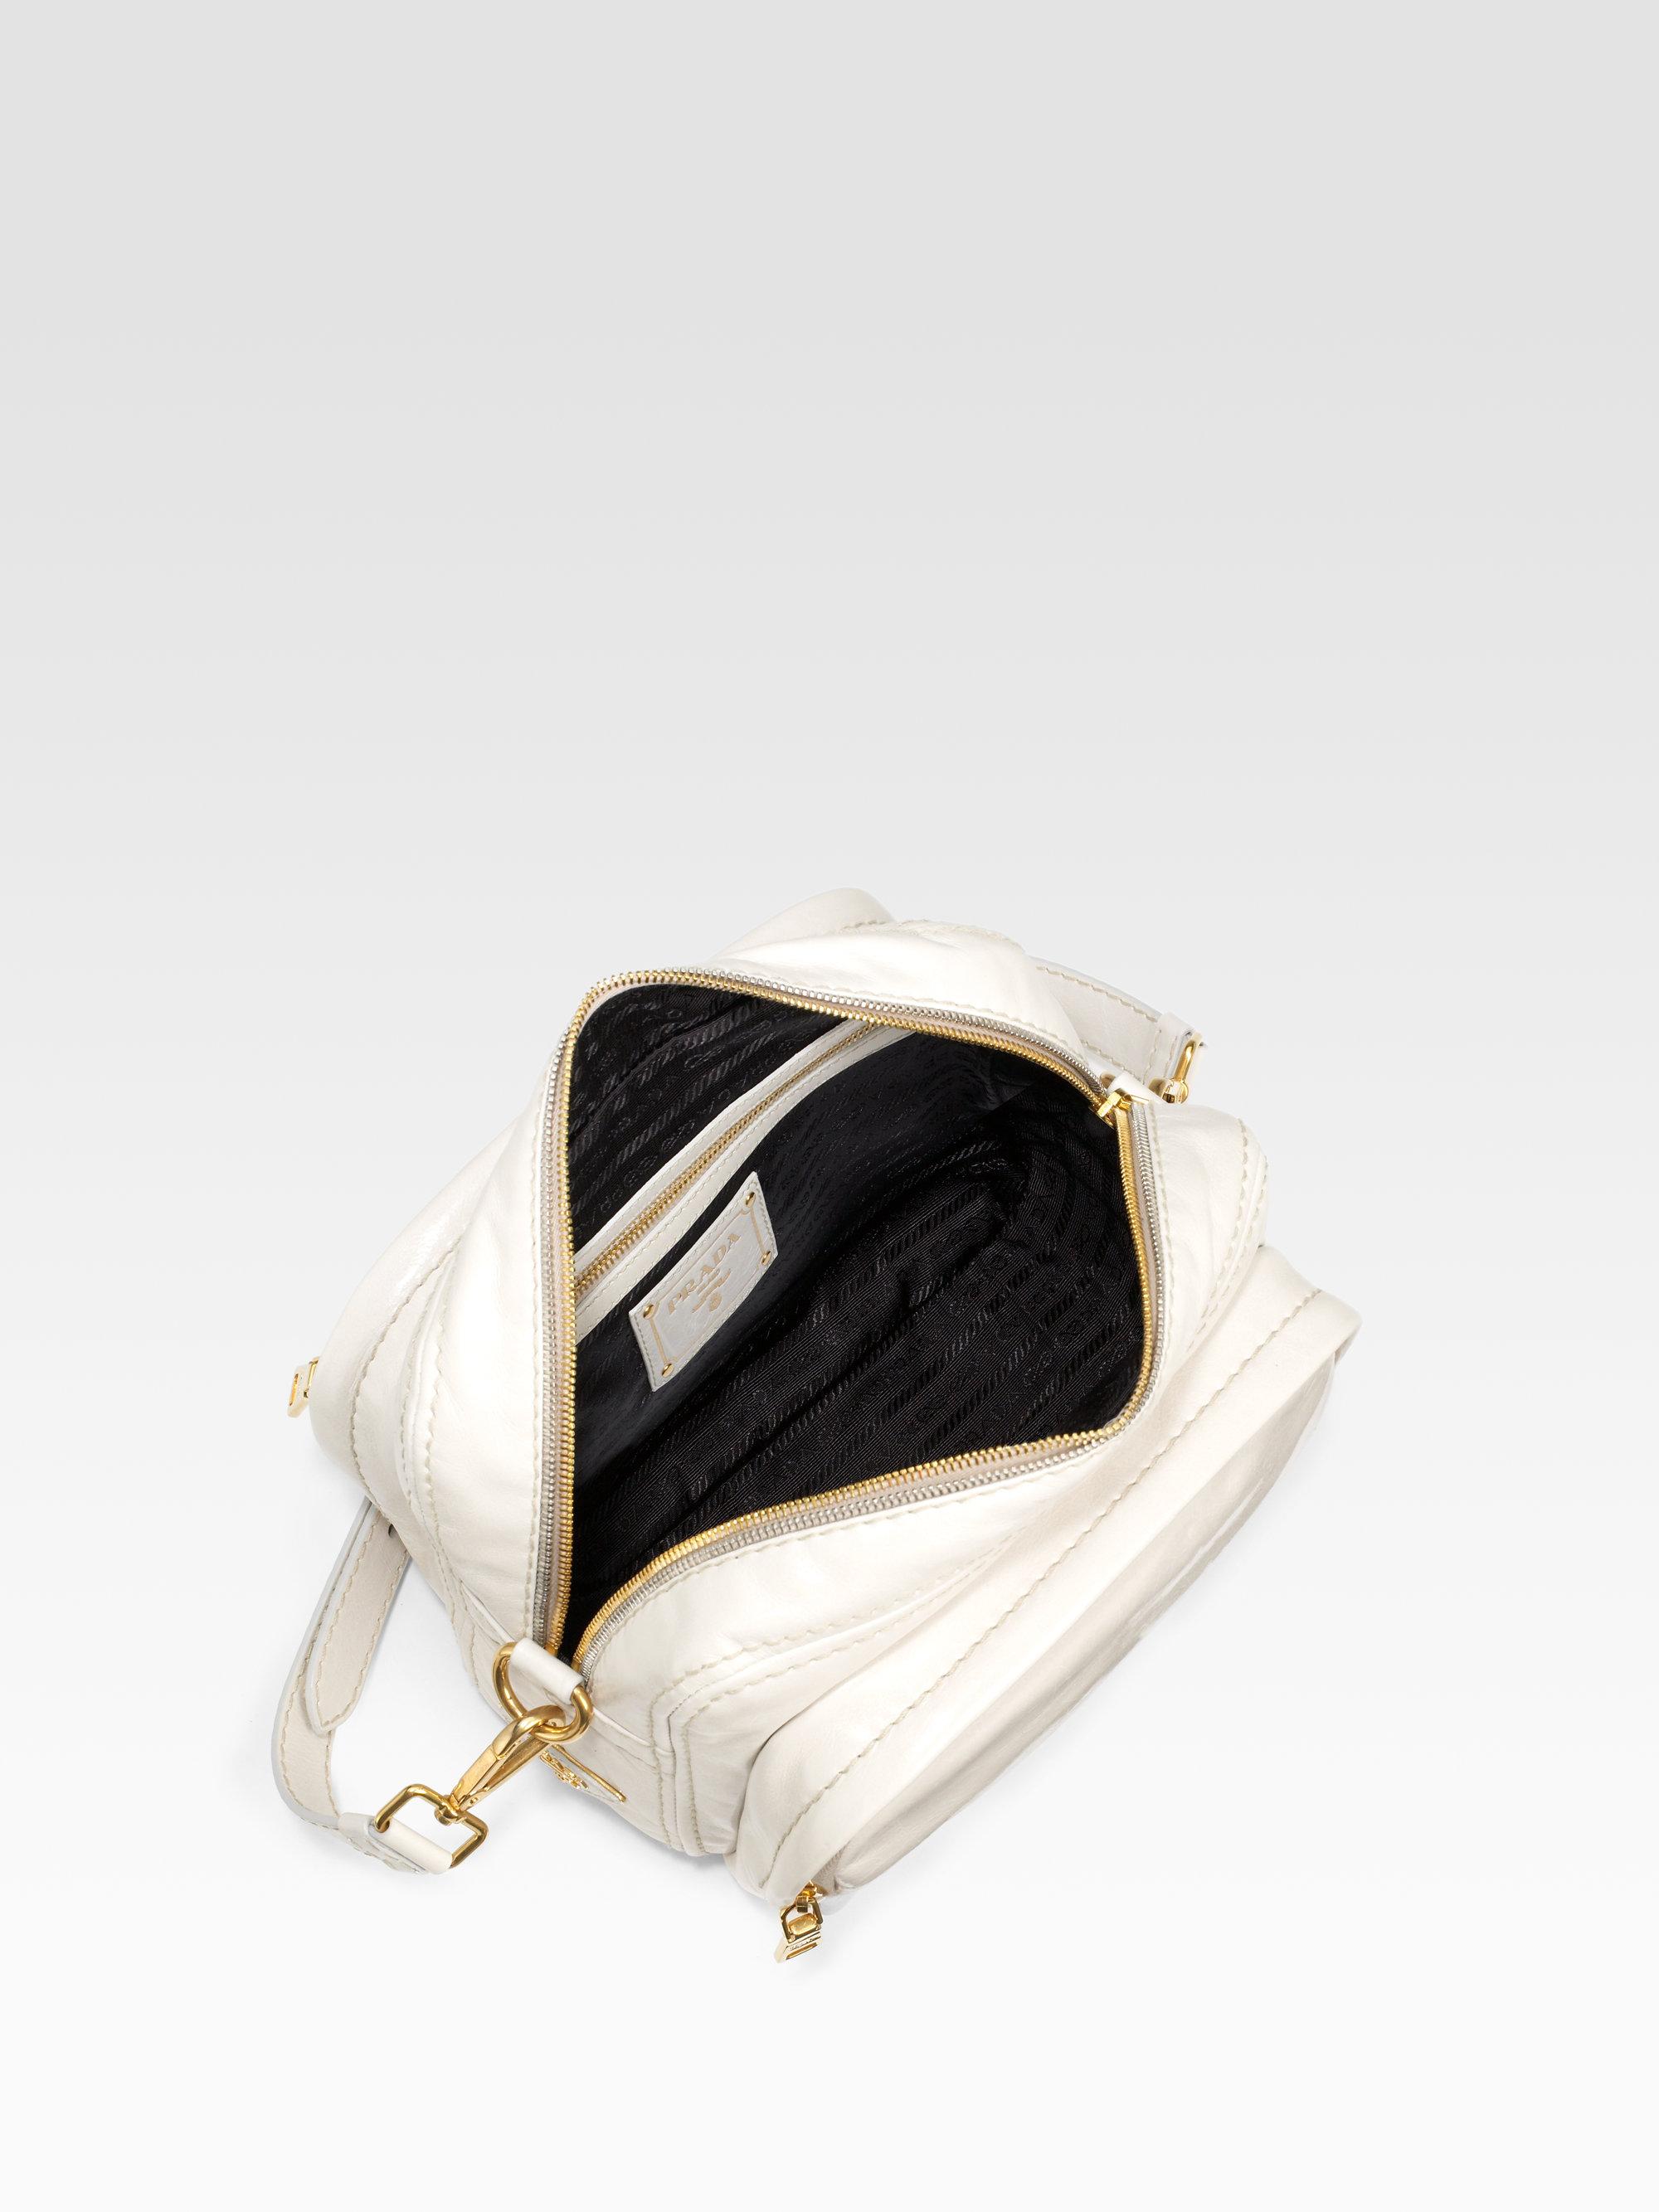 prada second hand bags replica chanel woc. Black Bedroom Furniture Sets. Home Design Ideas